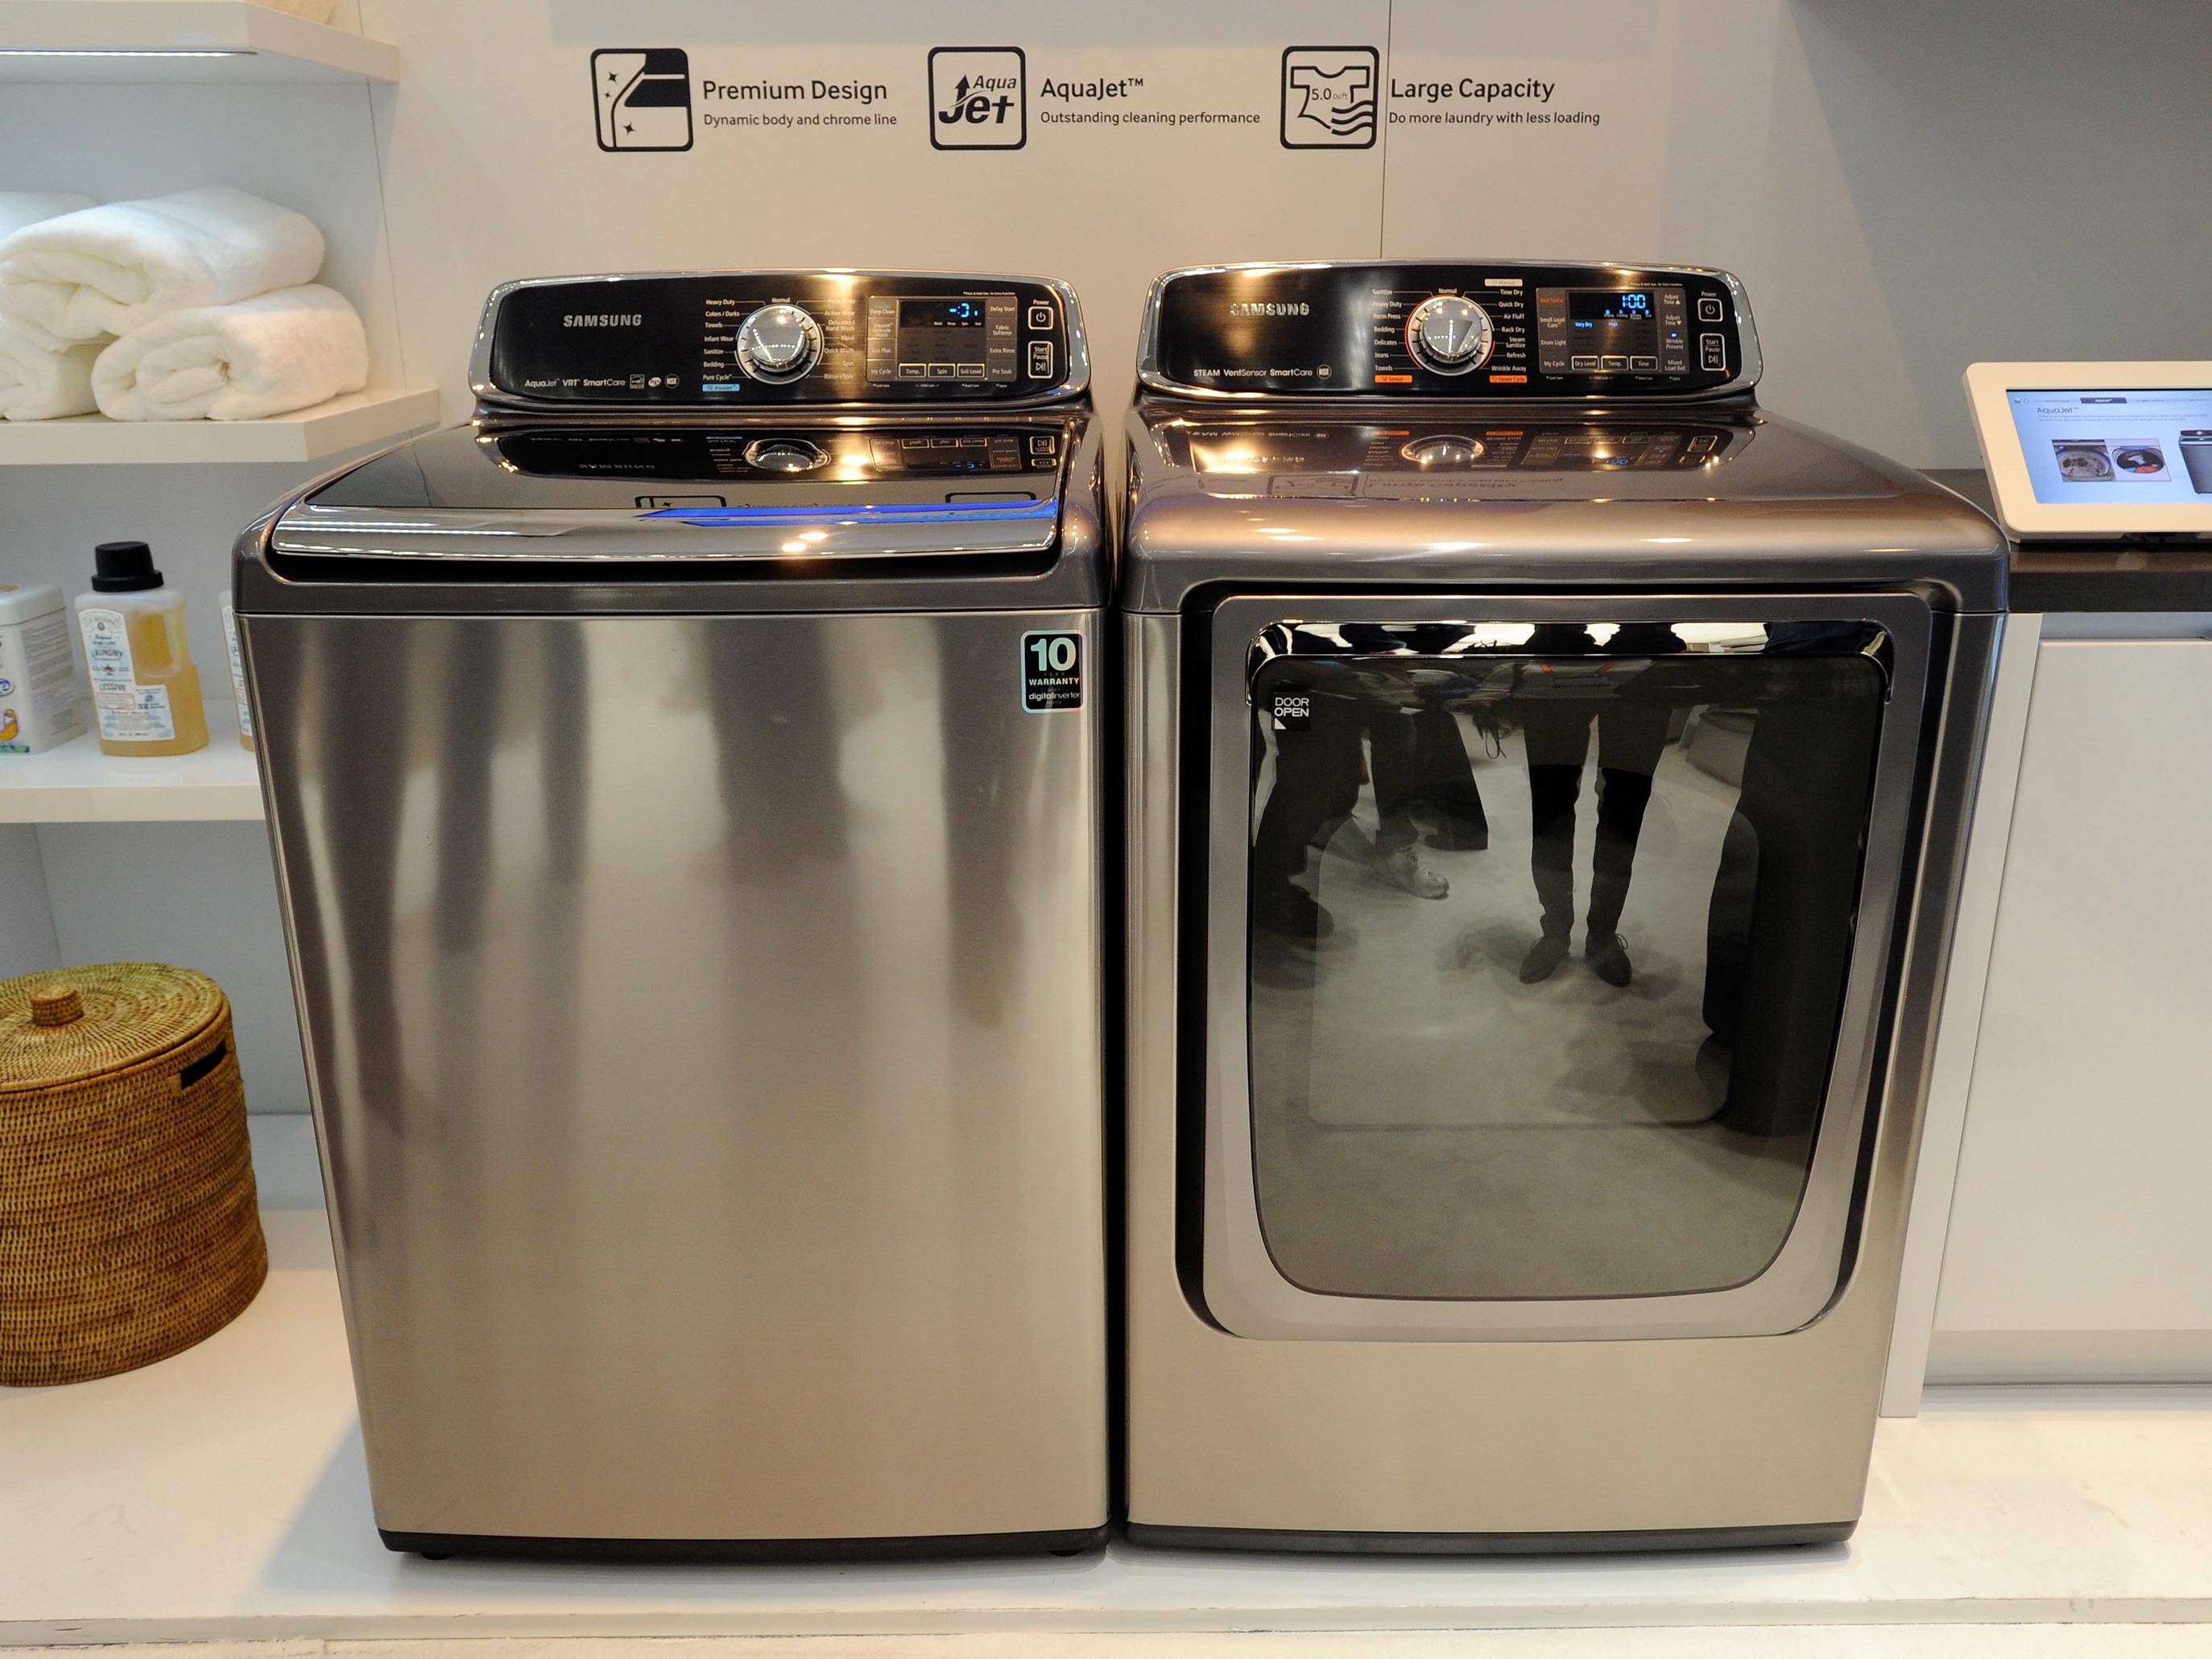 Samsung Recalls 2 8 Million Top Load Washing Machines